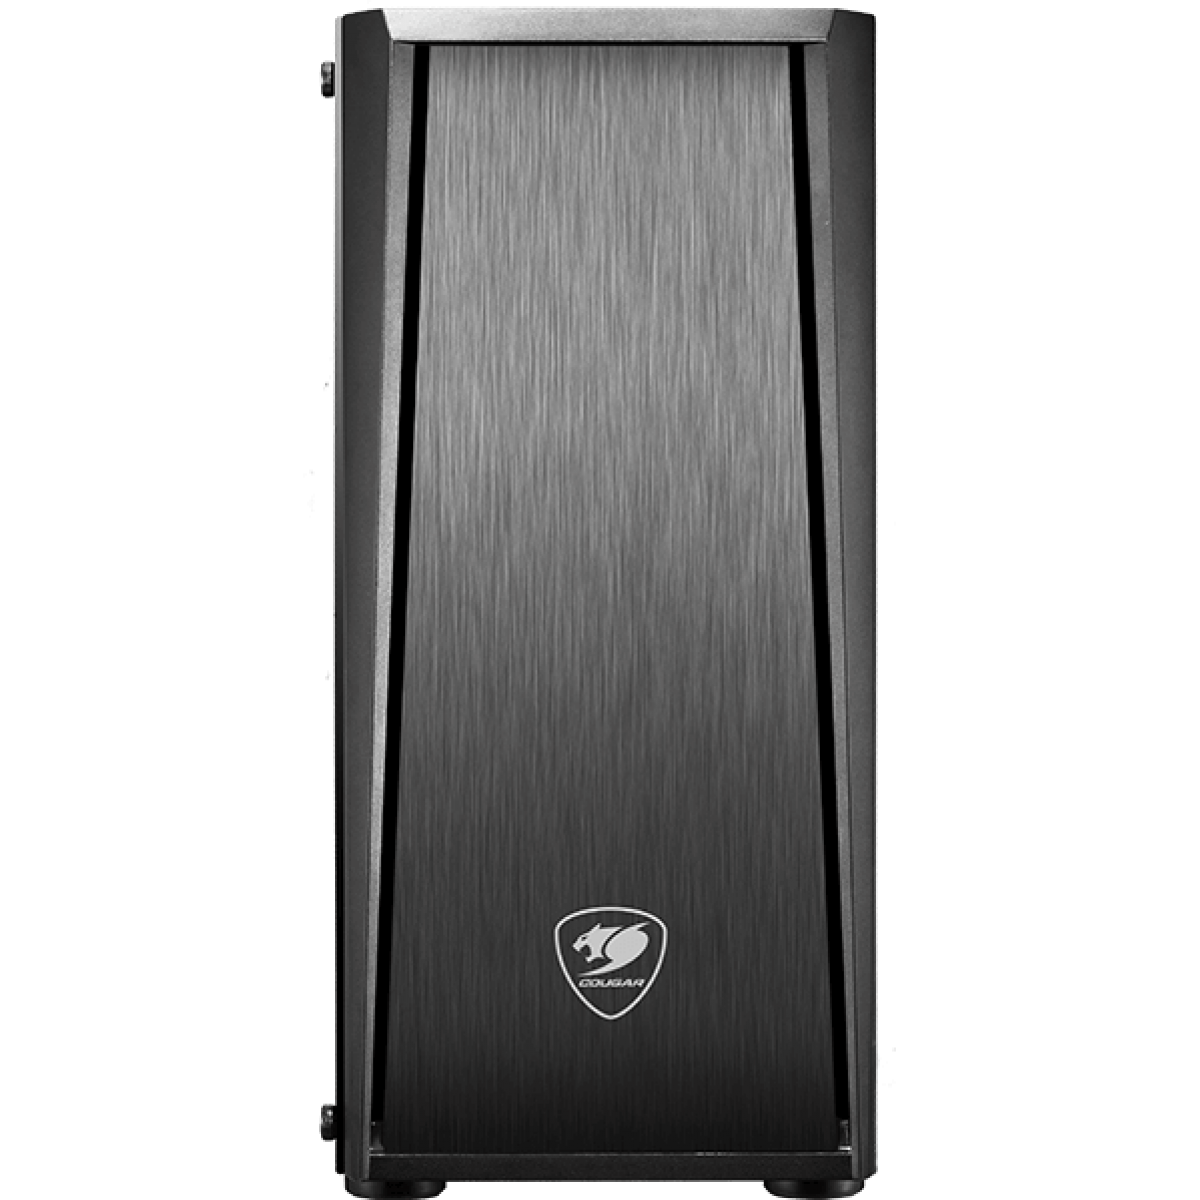 Gabinete Gamer Cougar MX340 385WMW0.0001 Vidro Temperado Mid Tower Preto Sem Fonte